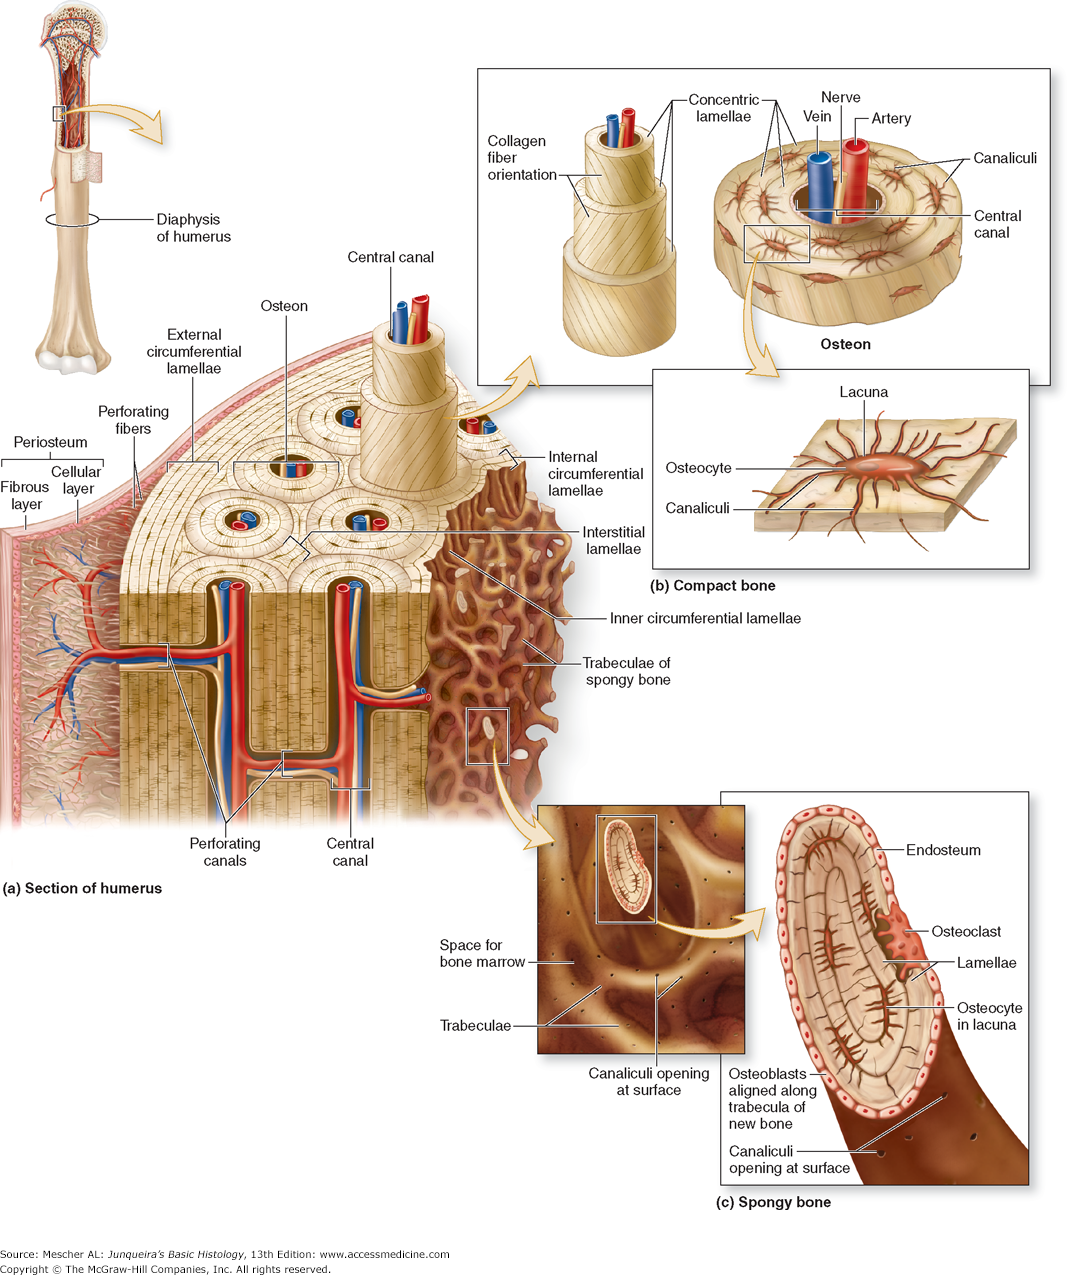 Bone - Diagram of compact and spongy bones | Histology - Cartilage ...